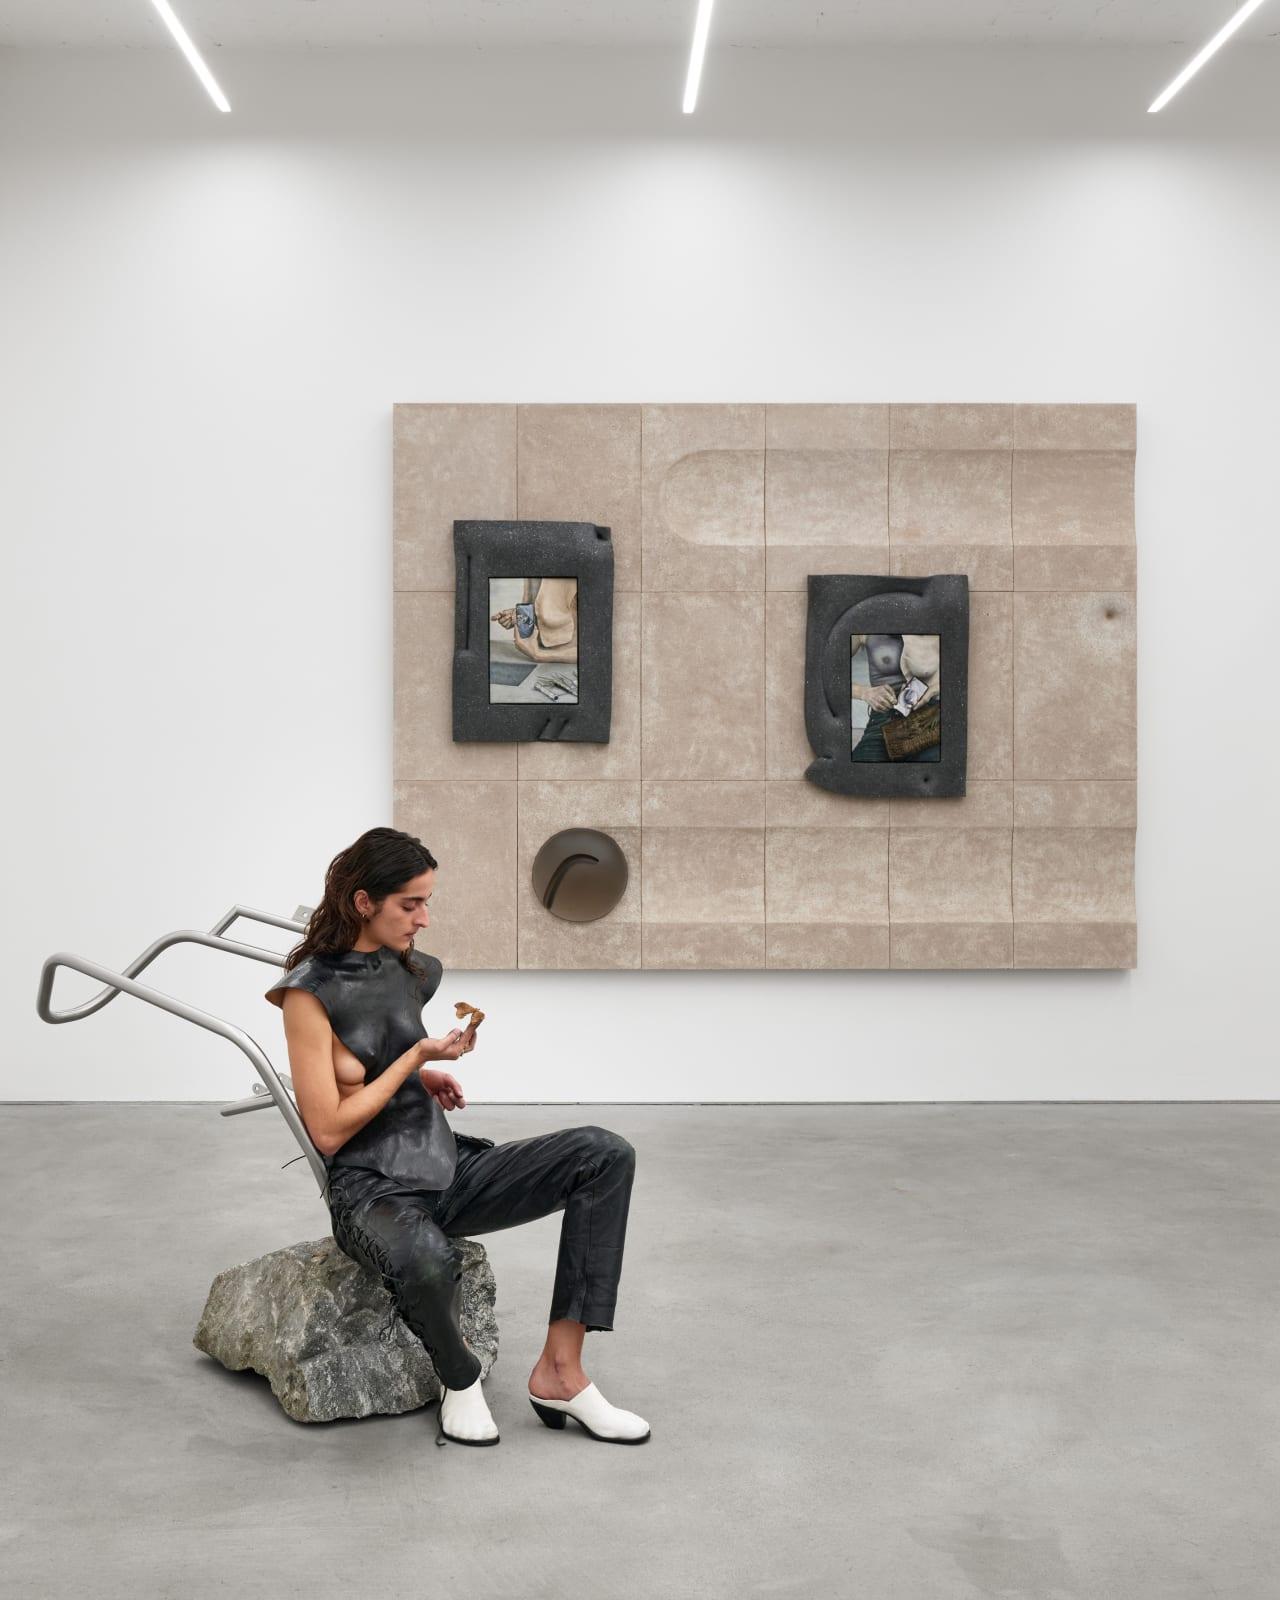 exhibition view, Nest, Klára Hosnedlová, Kraupa-Tuskany Zeidler, Berlin 2020